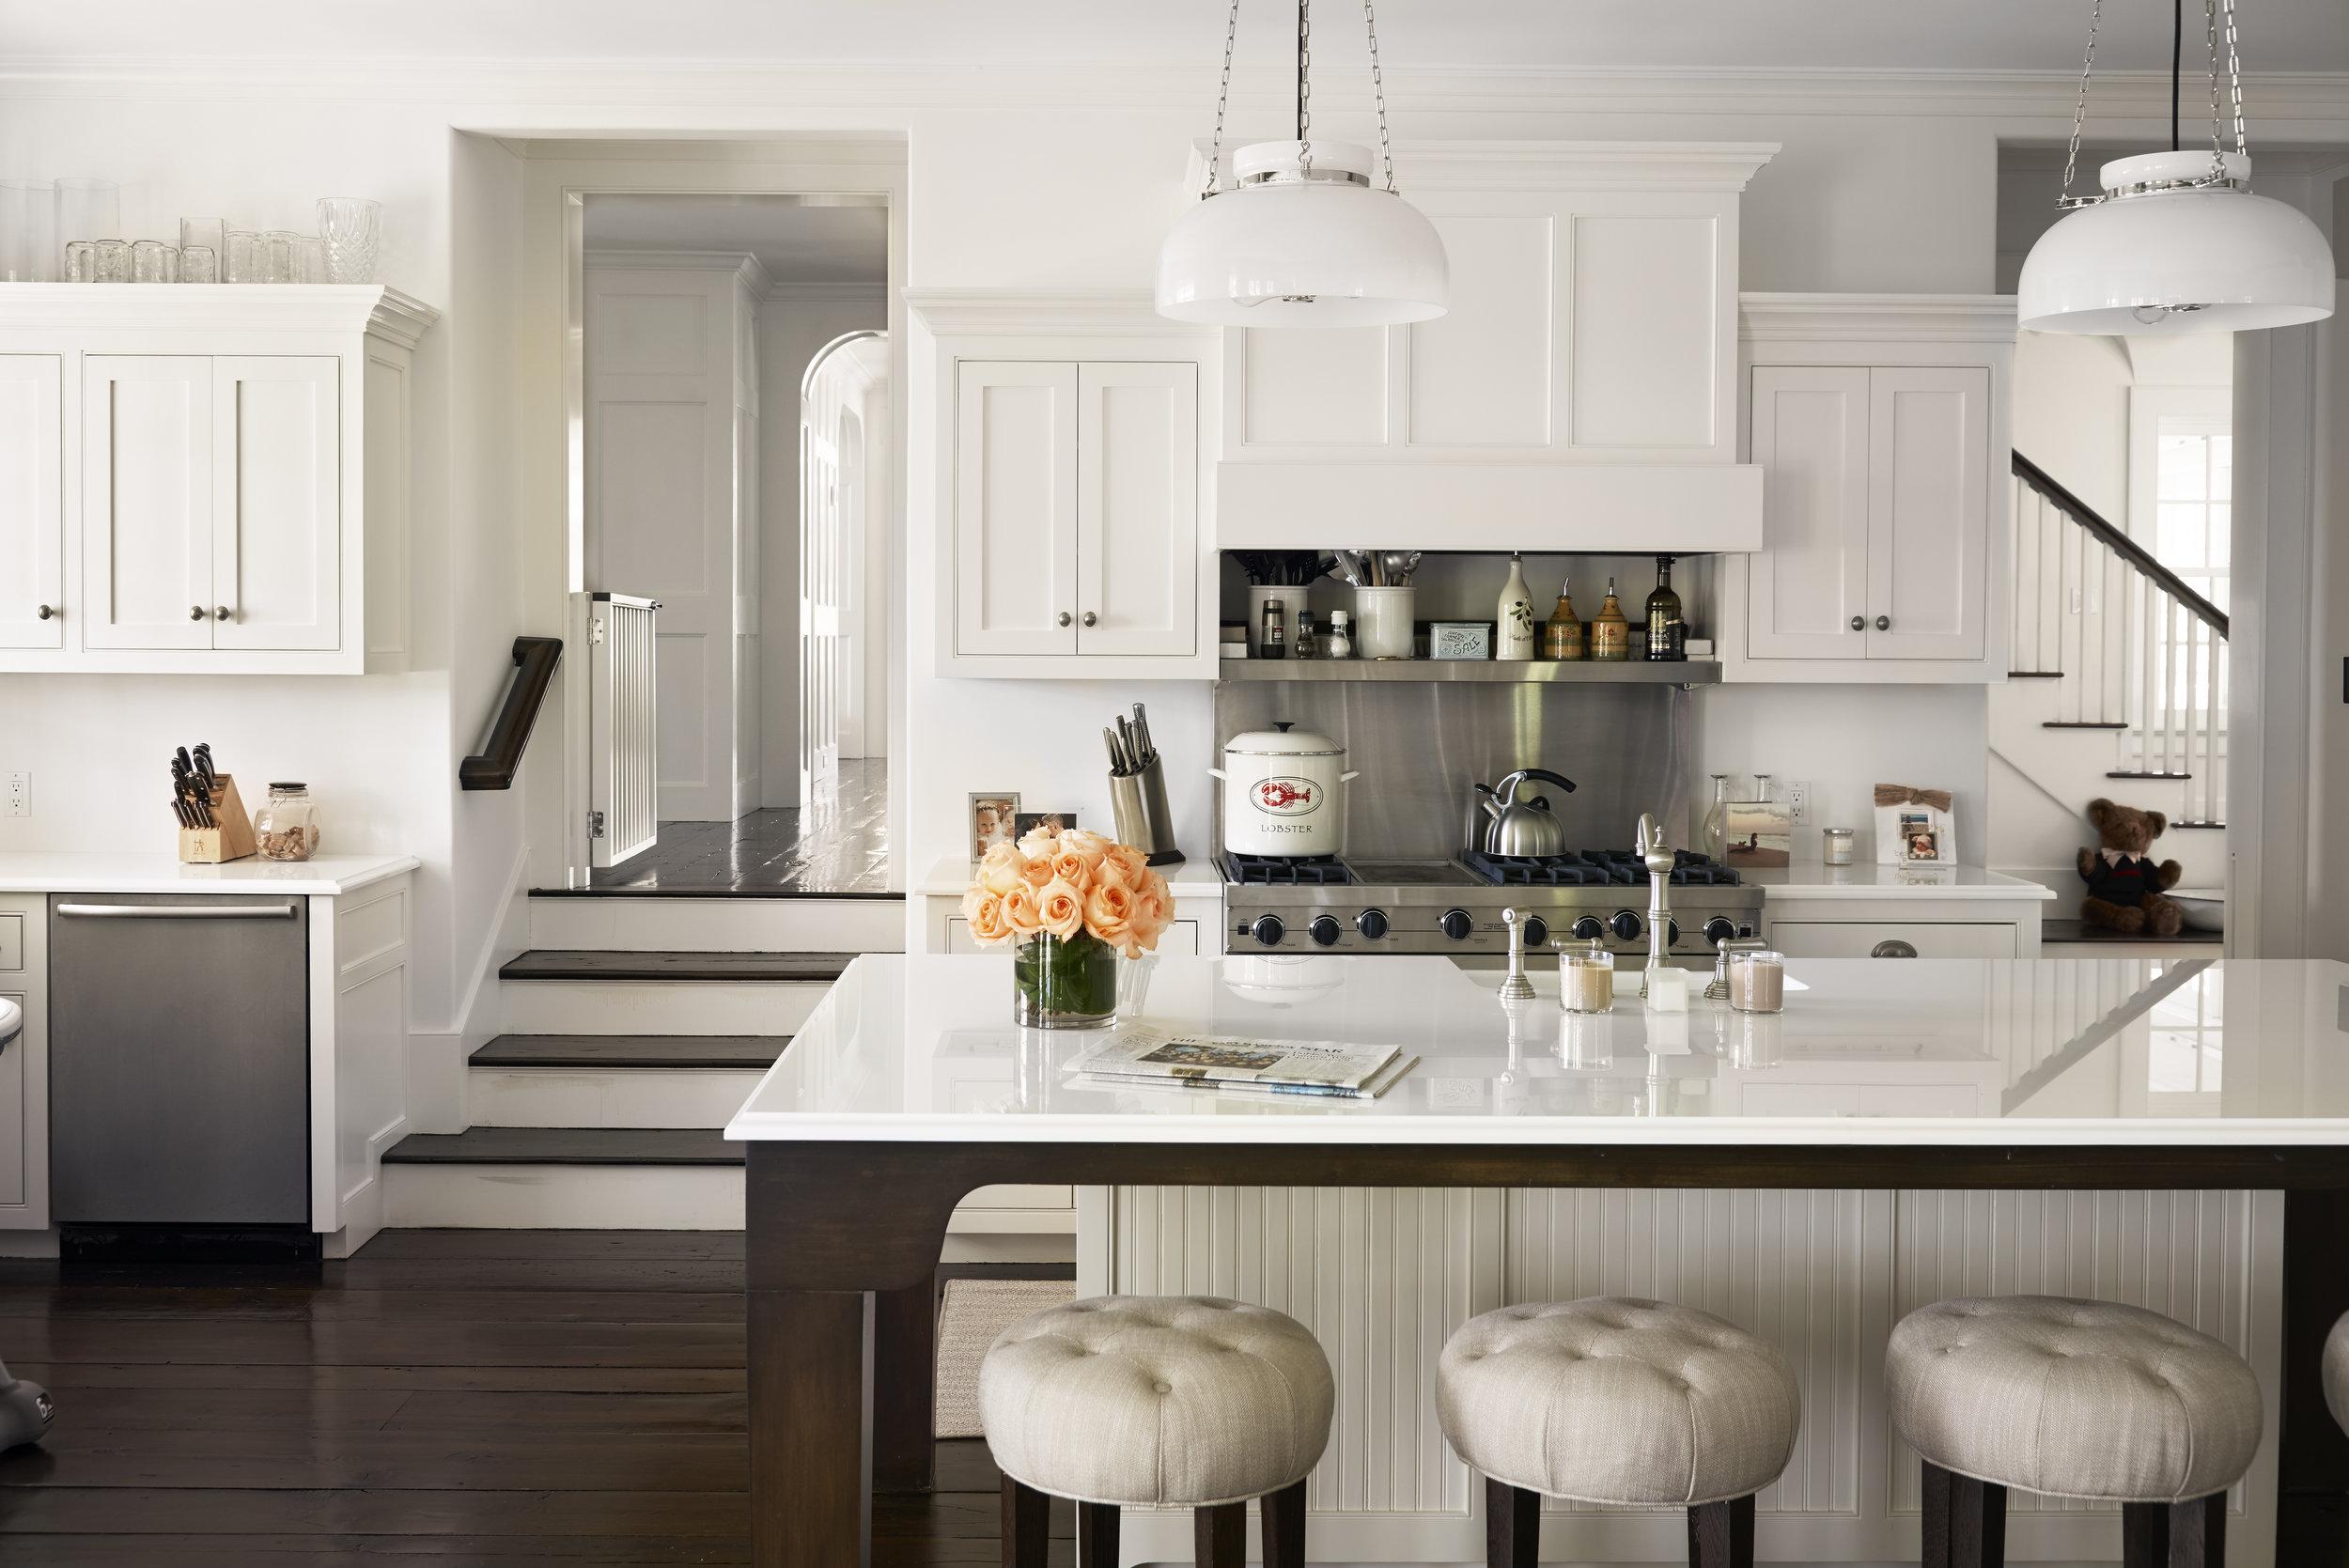 161005_Elle Decor_Alec Baldwin_52598_kitchen tighterhero.jpg